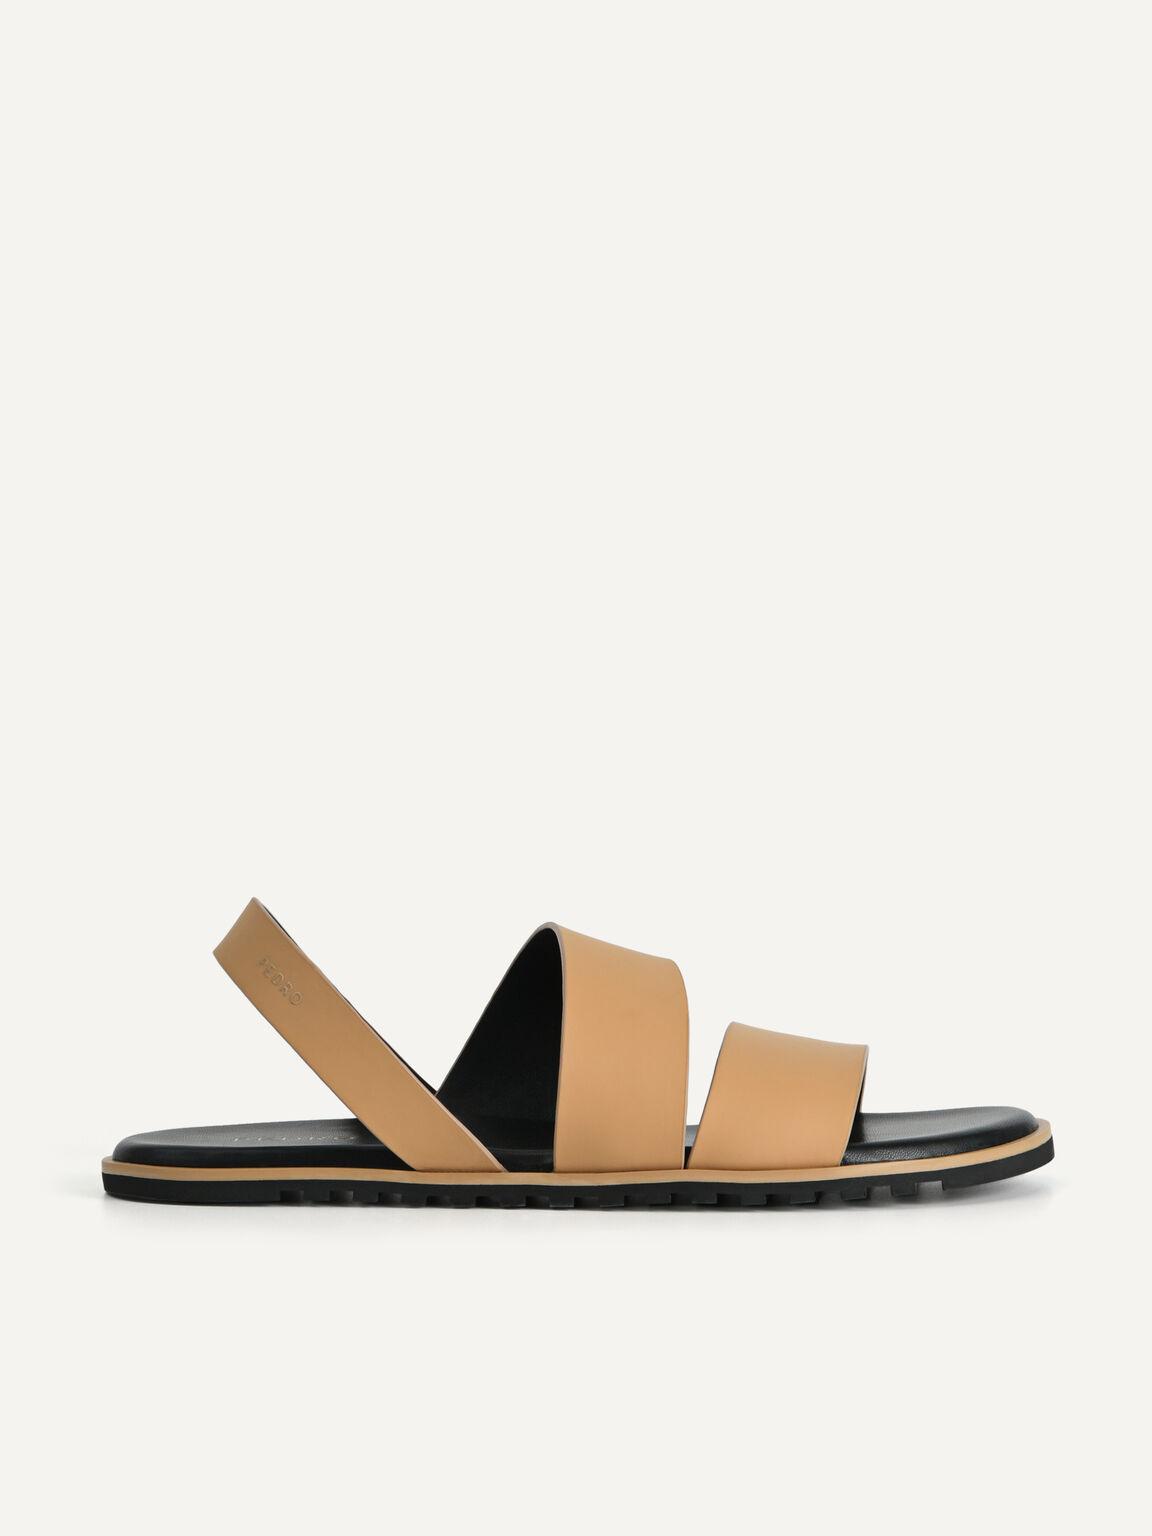 Double Strap Slingback Sandals, Sand, hi-res